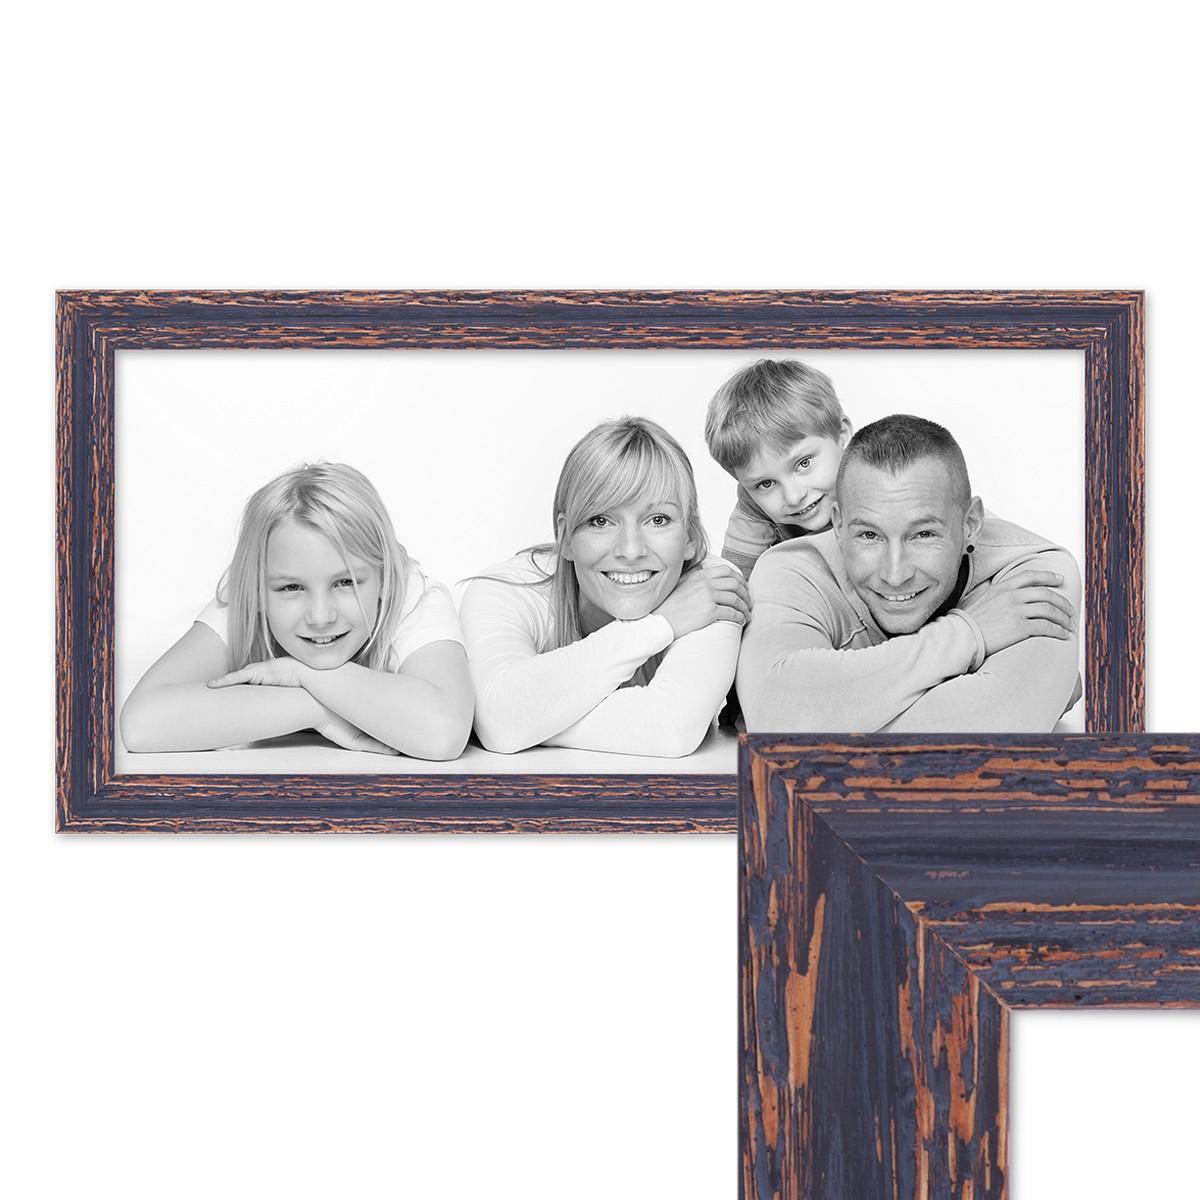 panorama bilderrahmen vintage 30x60 cm holz dunkelbraun shabby chic massivholz mit glasscheibe. Black Bedroom Furniture Sets. Home Design Ideas